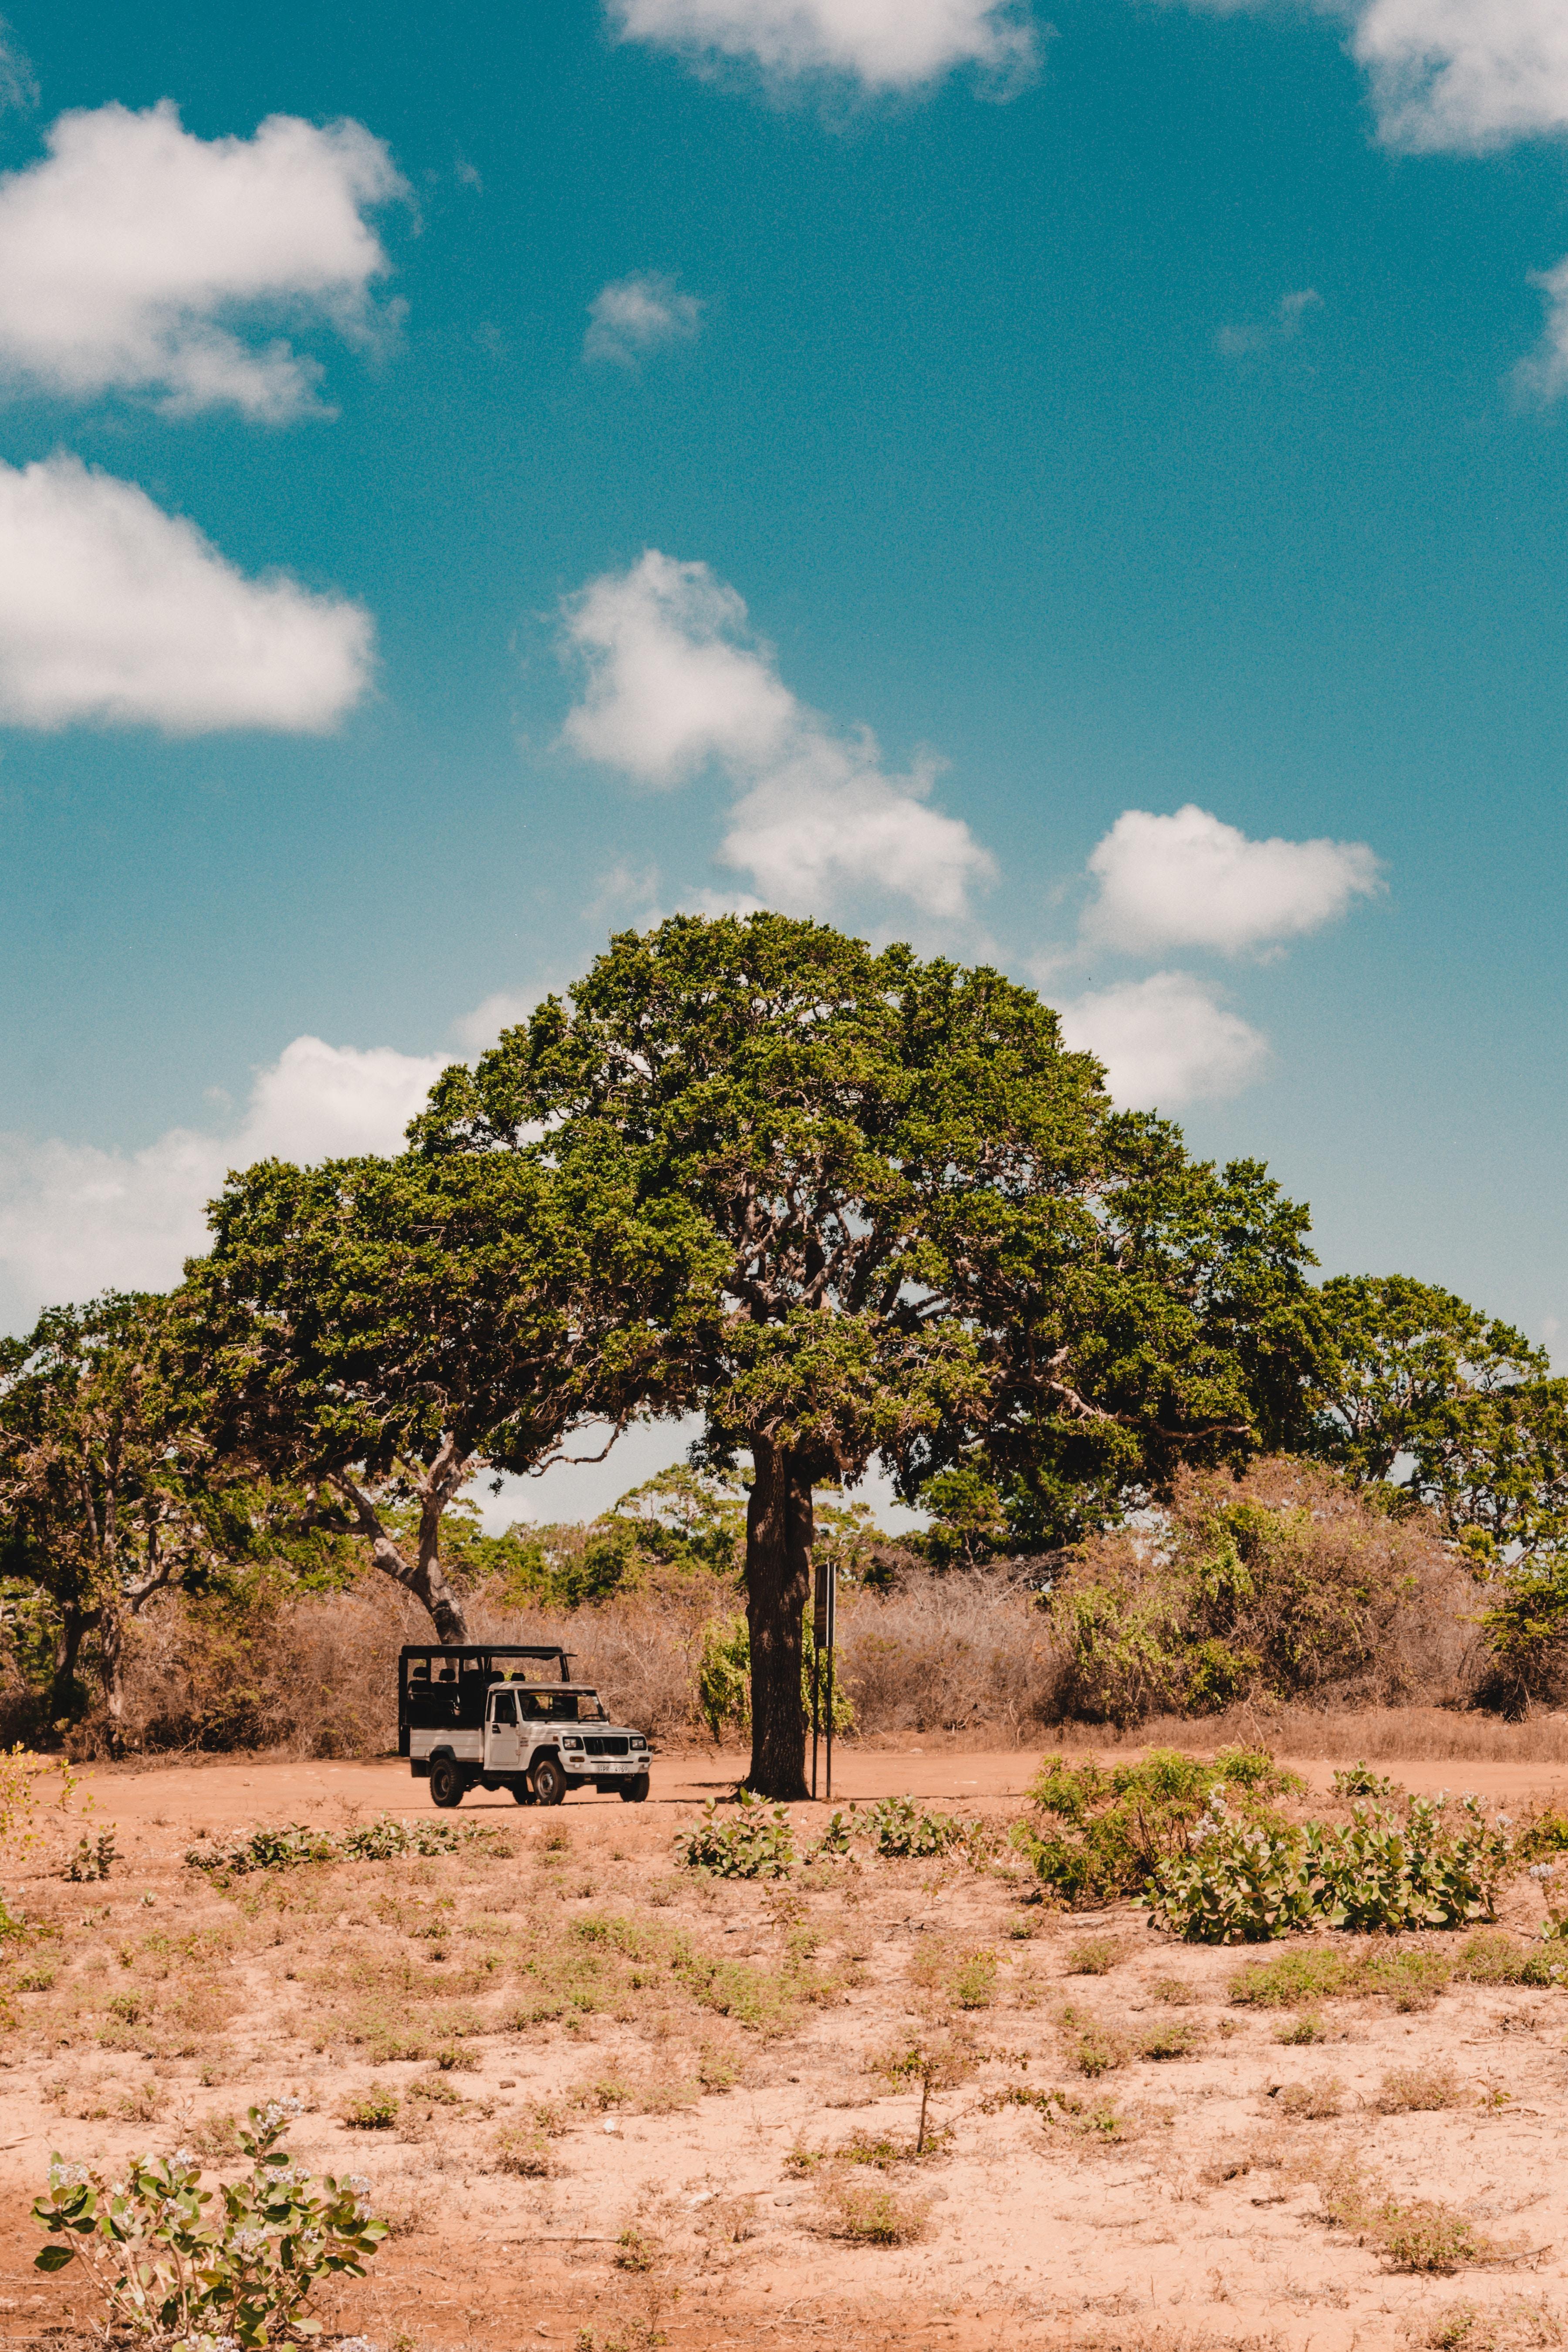 78555 download wallpaper Nature, Wood, Tree, Car, Machine, Savanna, Wildlife, Vegetation, Bush screensavers and pictures for free